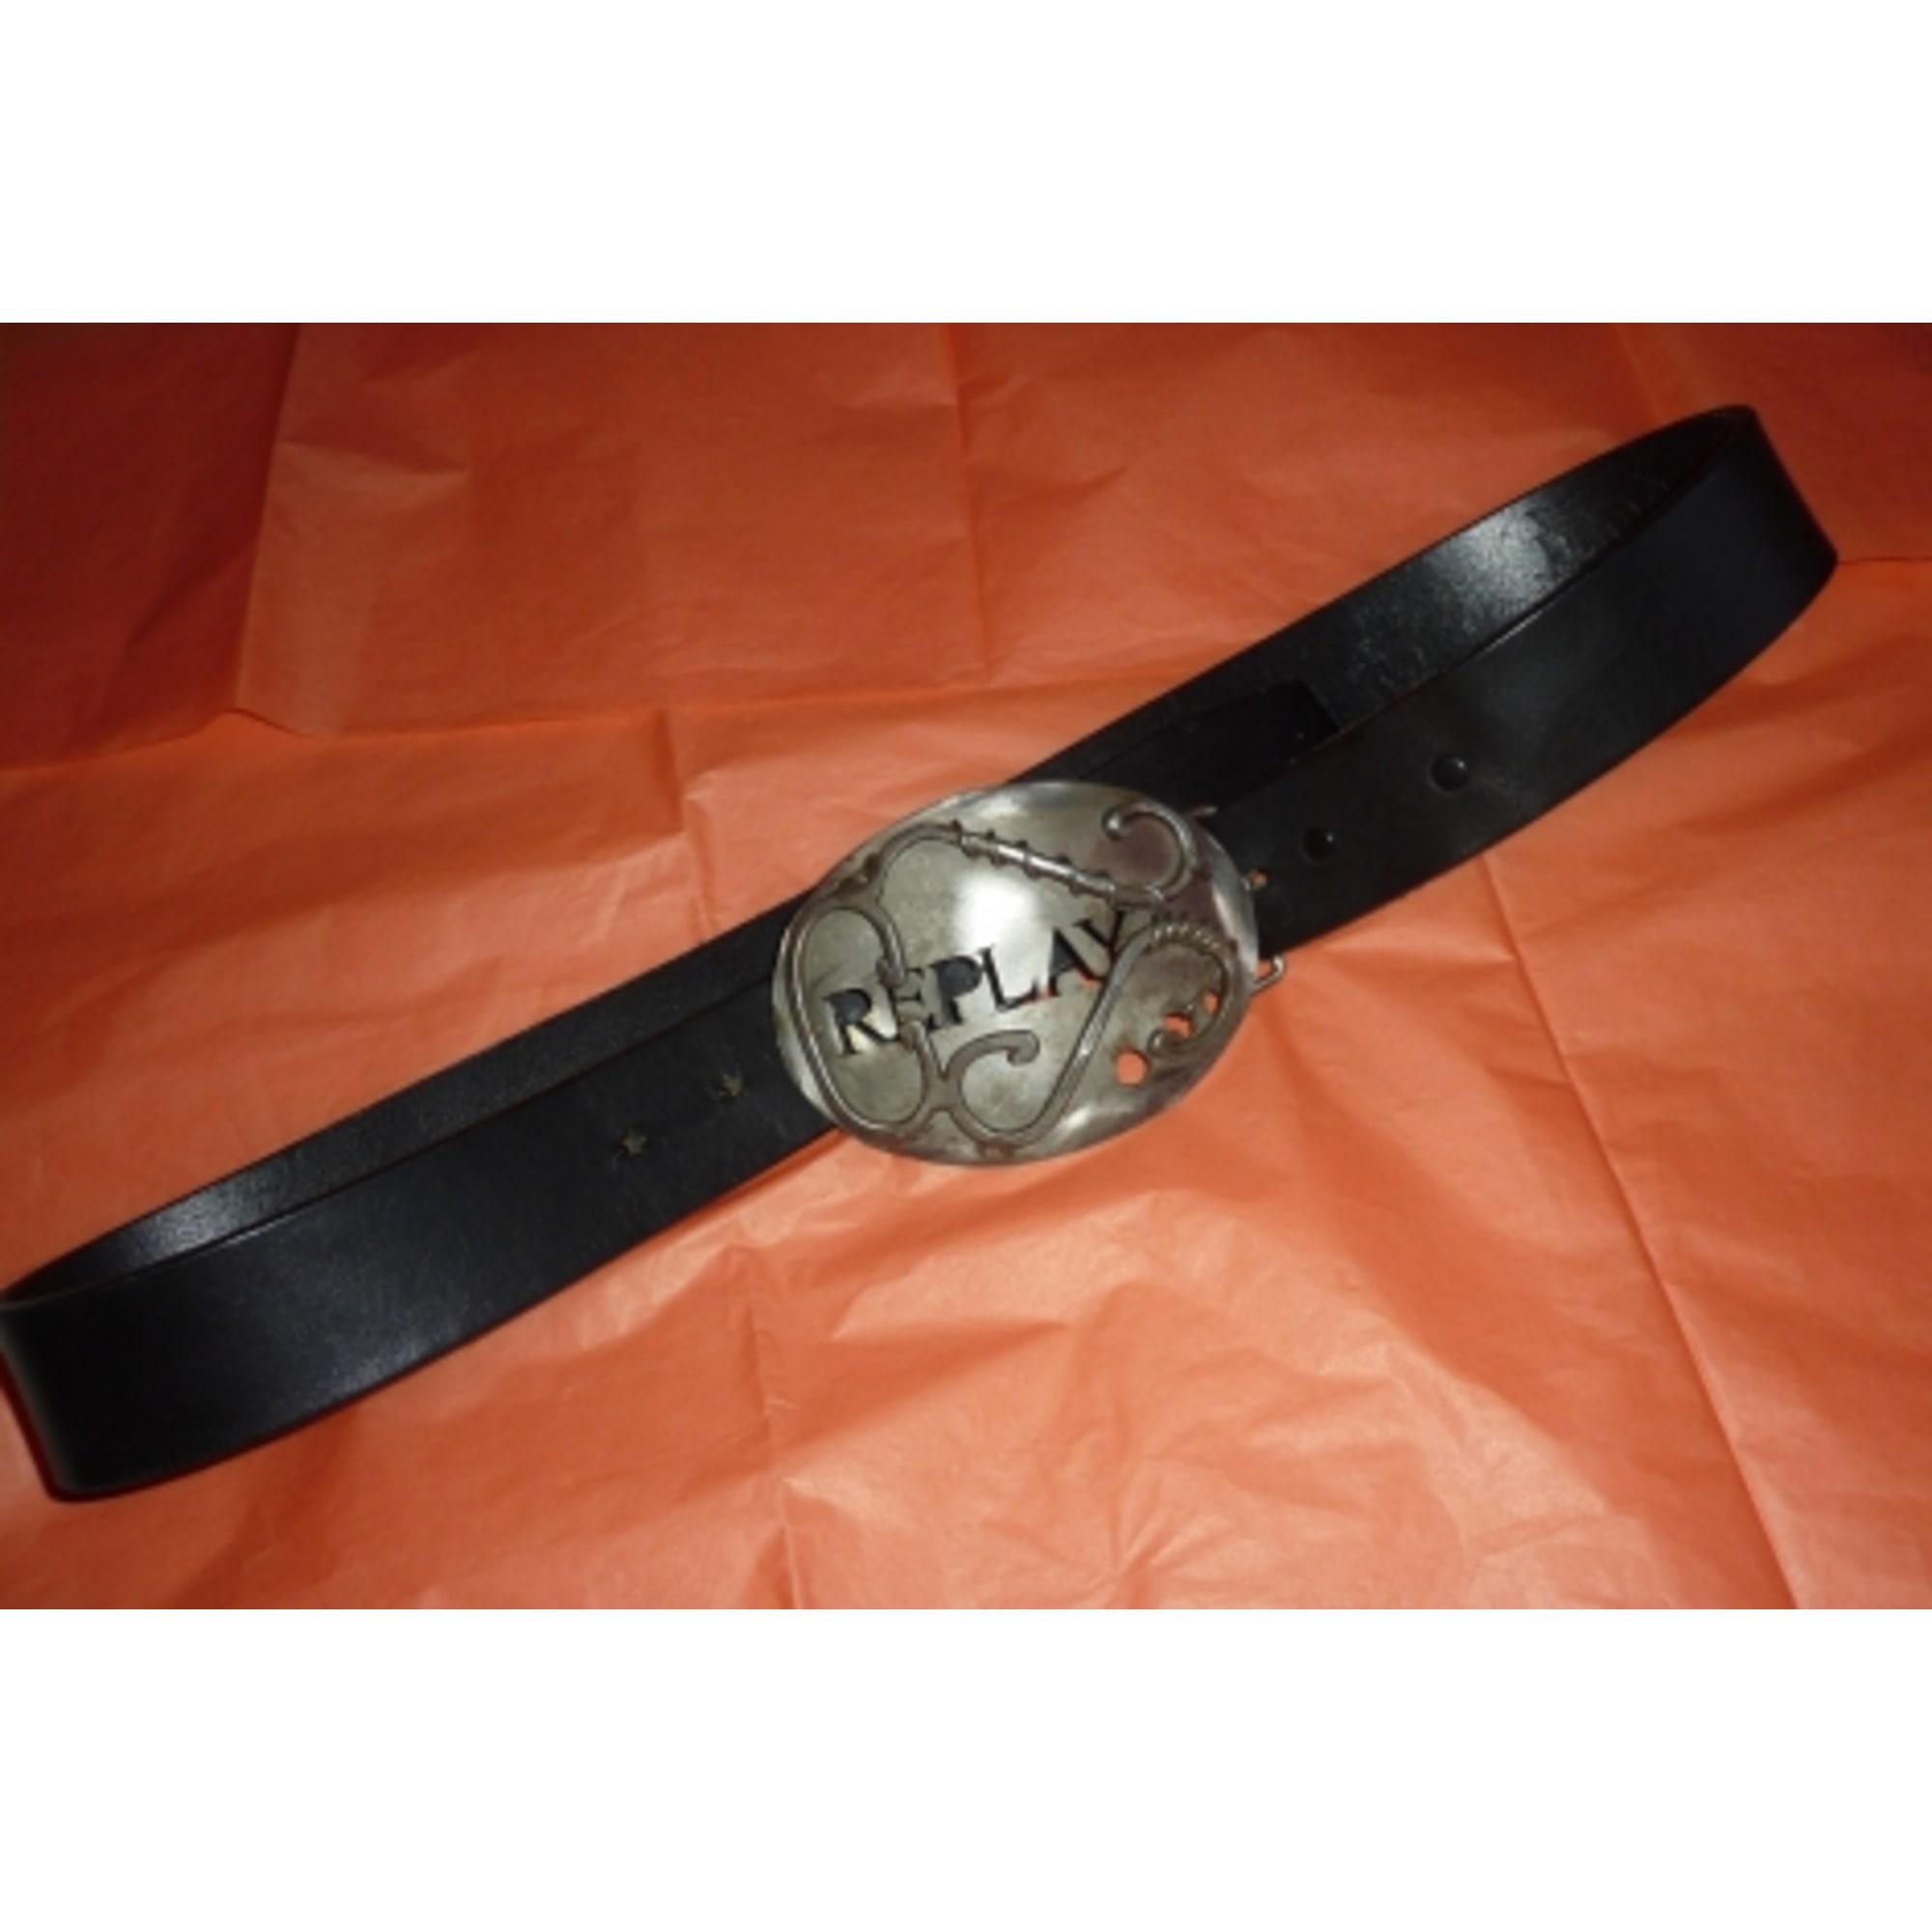 Ceinture REPLAY 90 noir vendu par Meniru - 7015549 5e62efd54f7